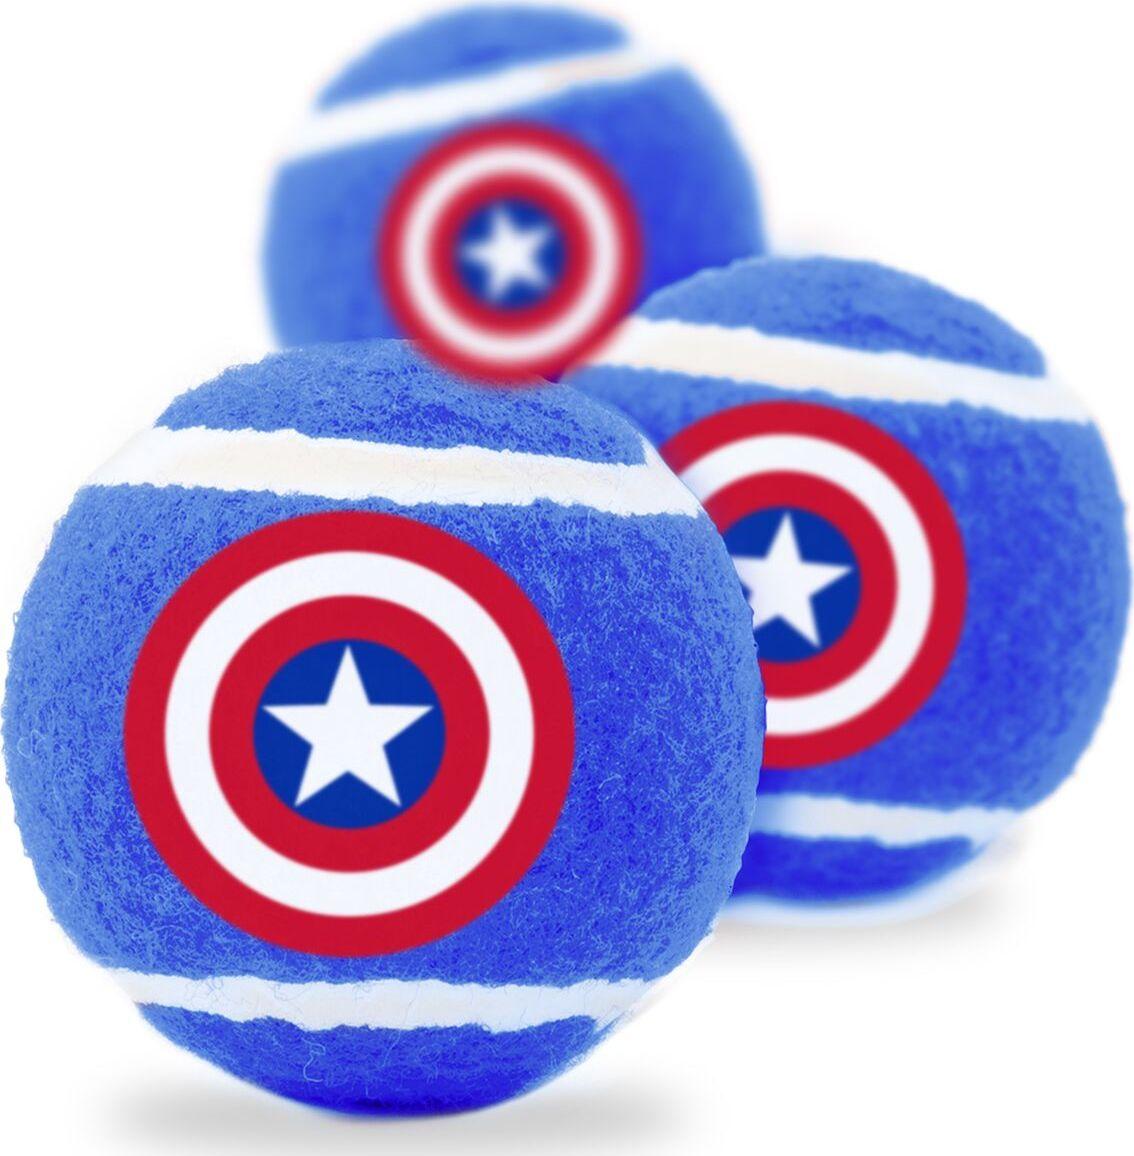 Апорт для собак Buckle-Down Теннисный мяч Капитан Америка, синий, 7 см, 3 шт фото